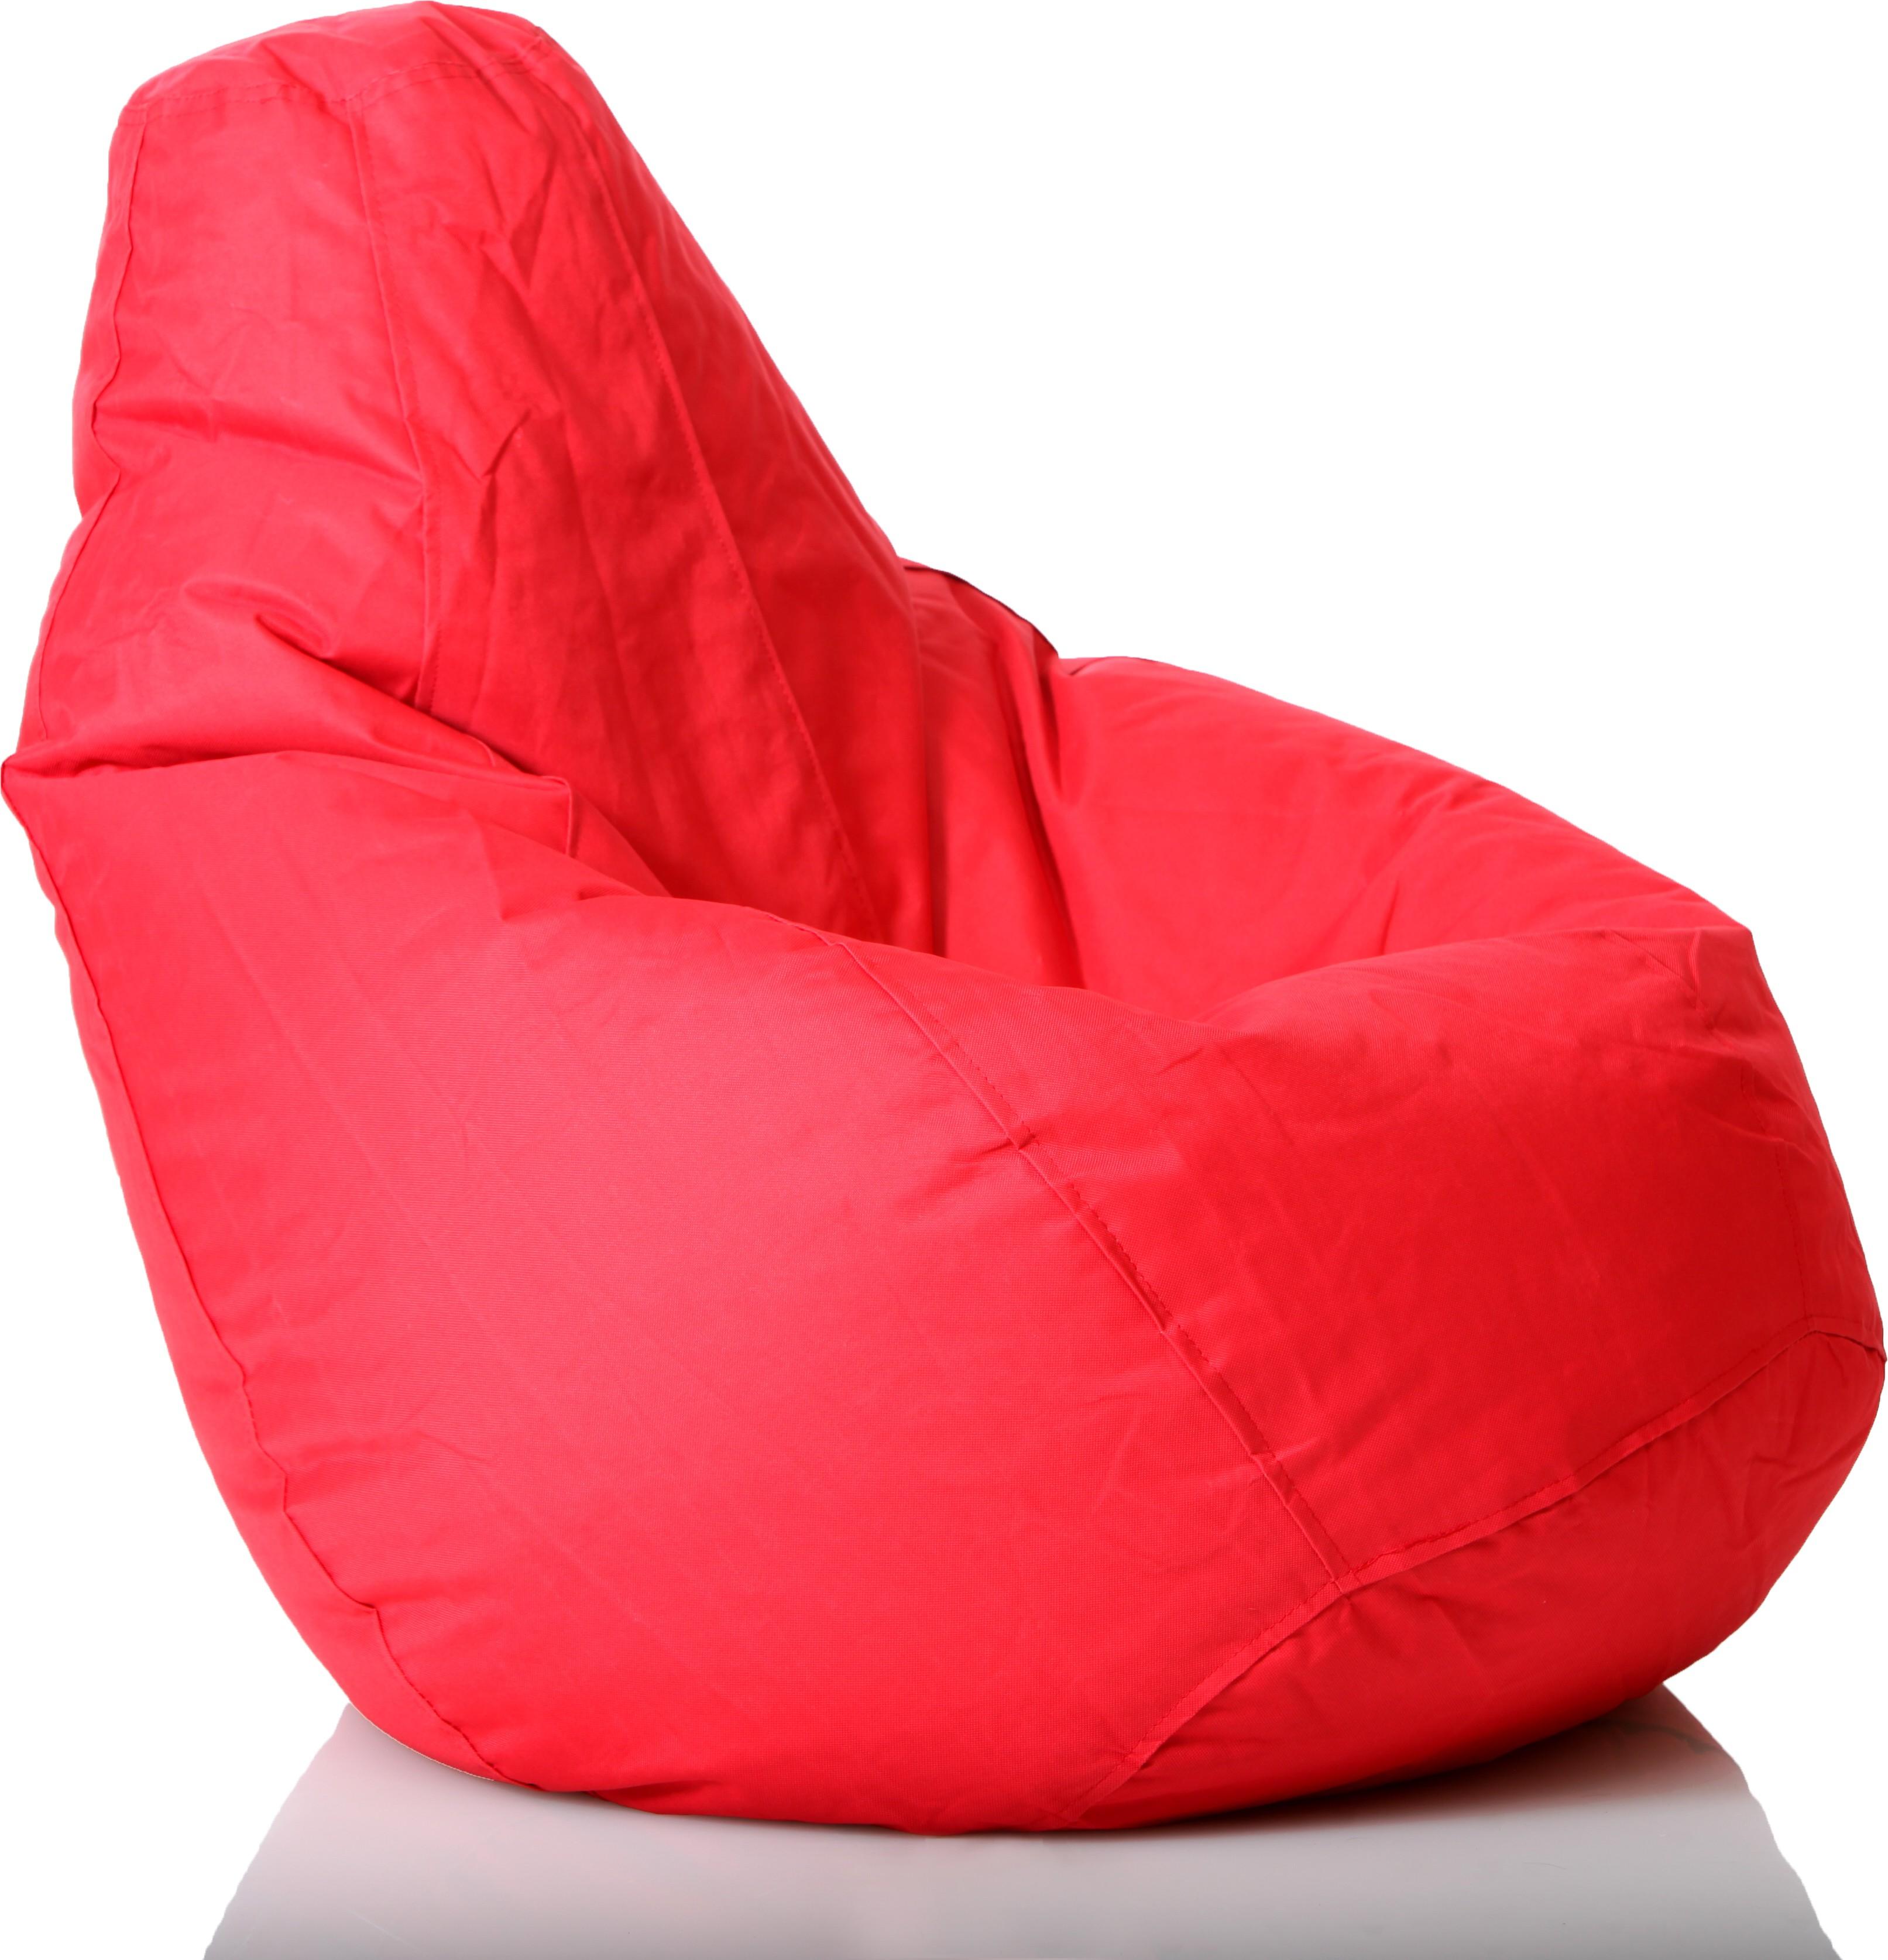 Comfy Bean Bags XXXL Bag CoveLowest Price By FlipkartRs 79900